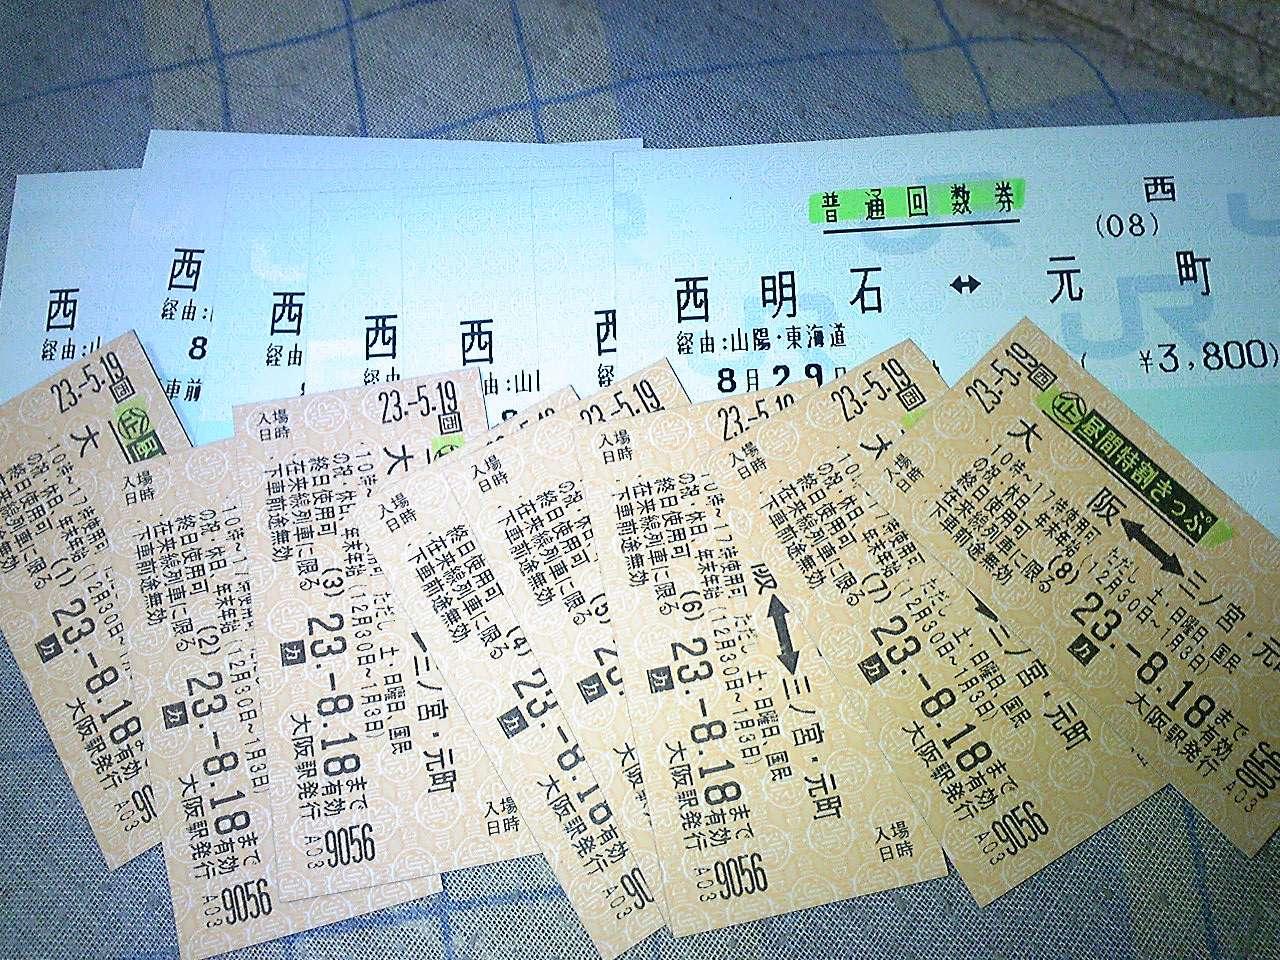 Rail/06)コミコミ前夜祭